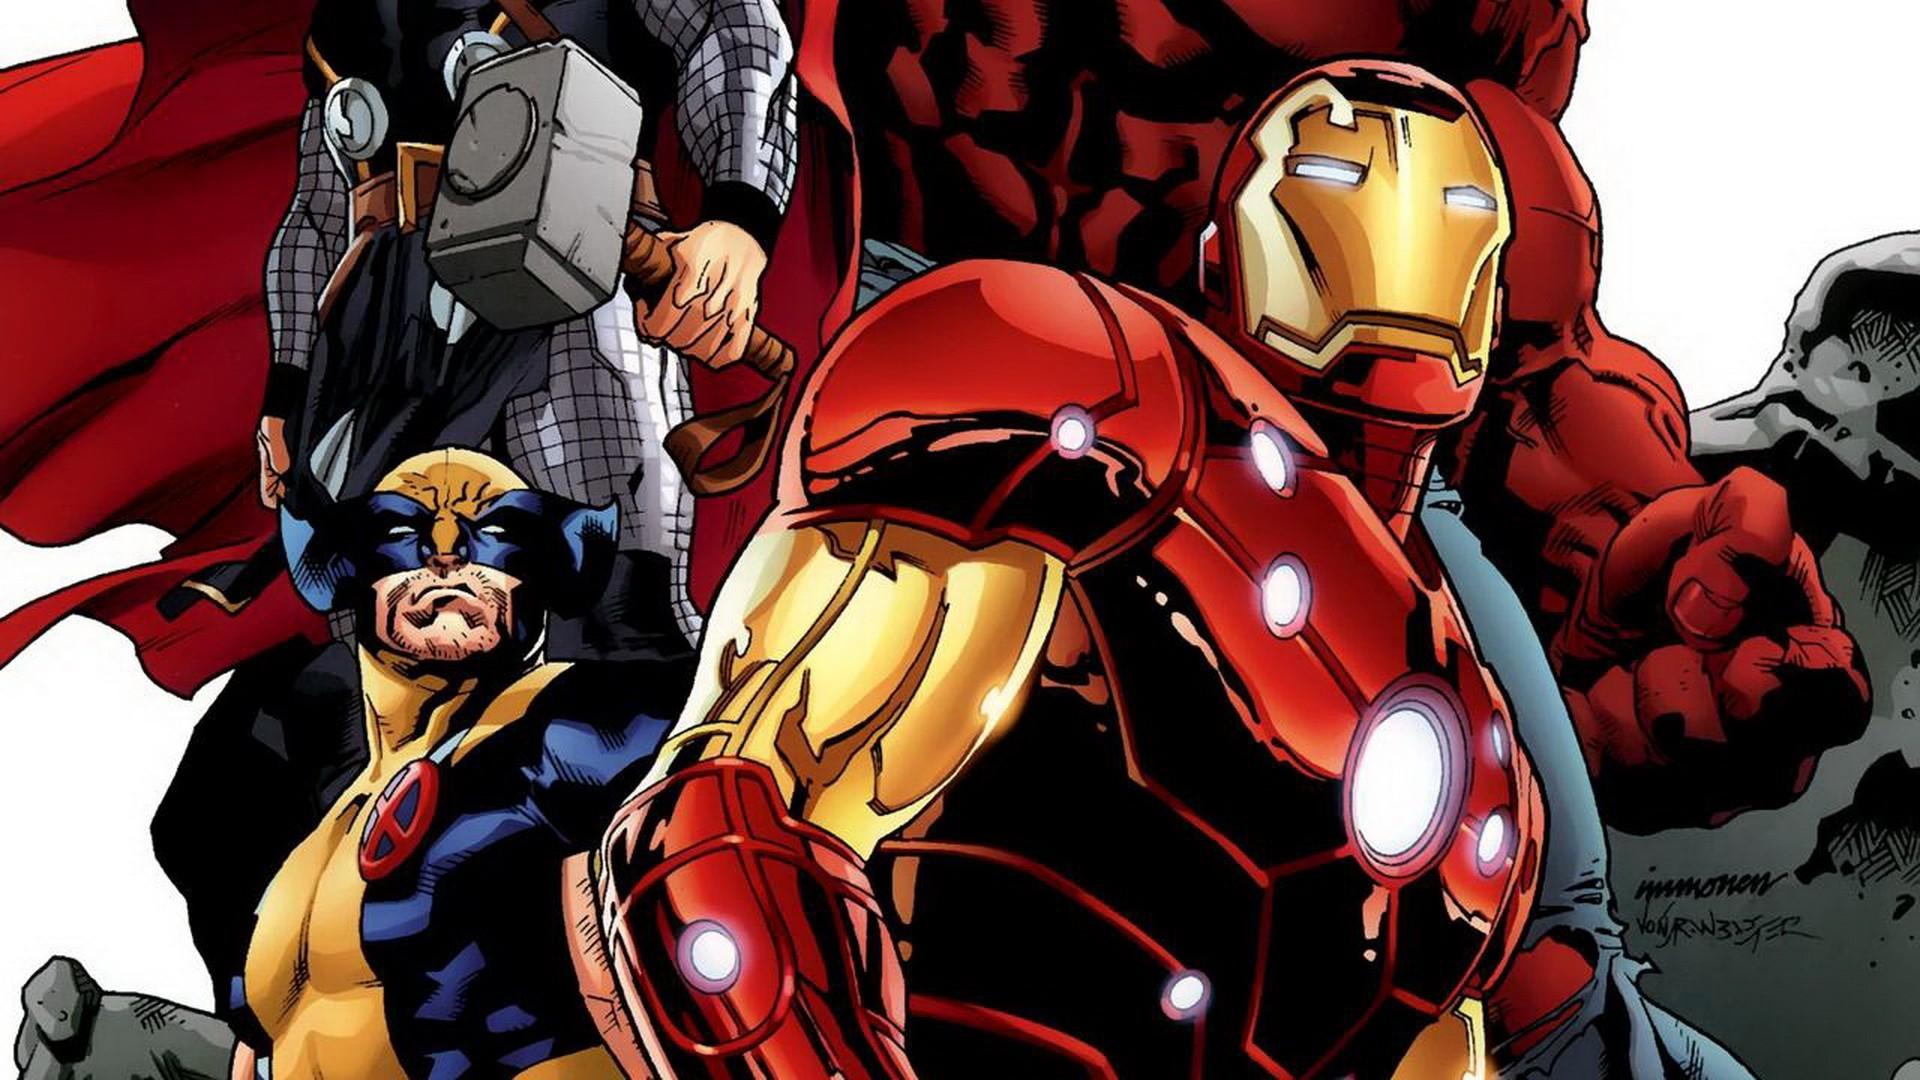 Iron Man Comic Wallpapers Android - Wickedsa com